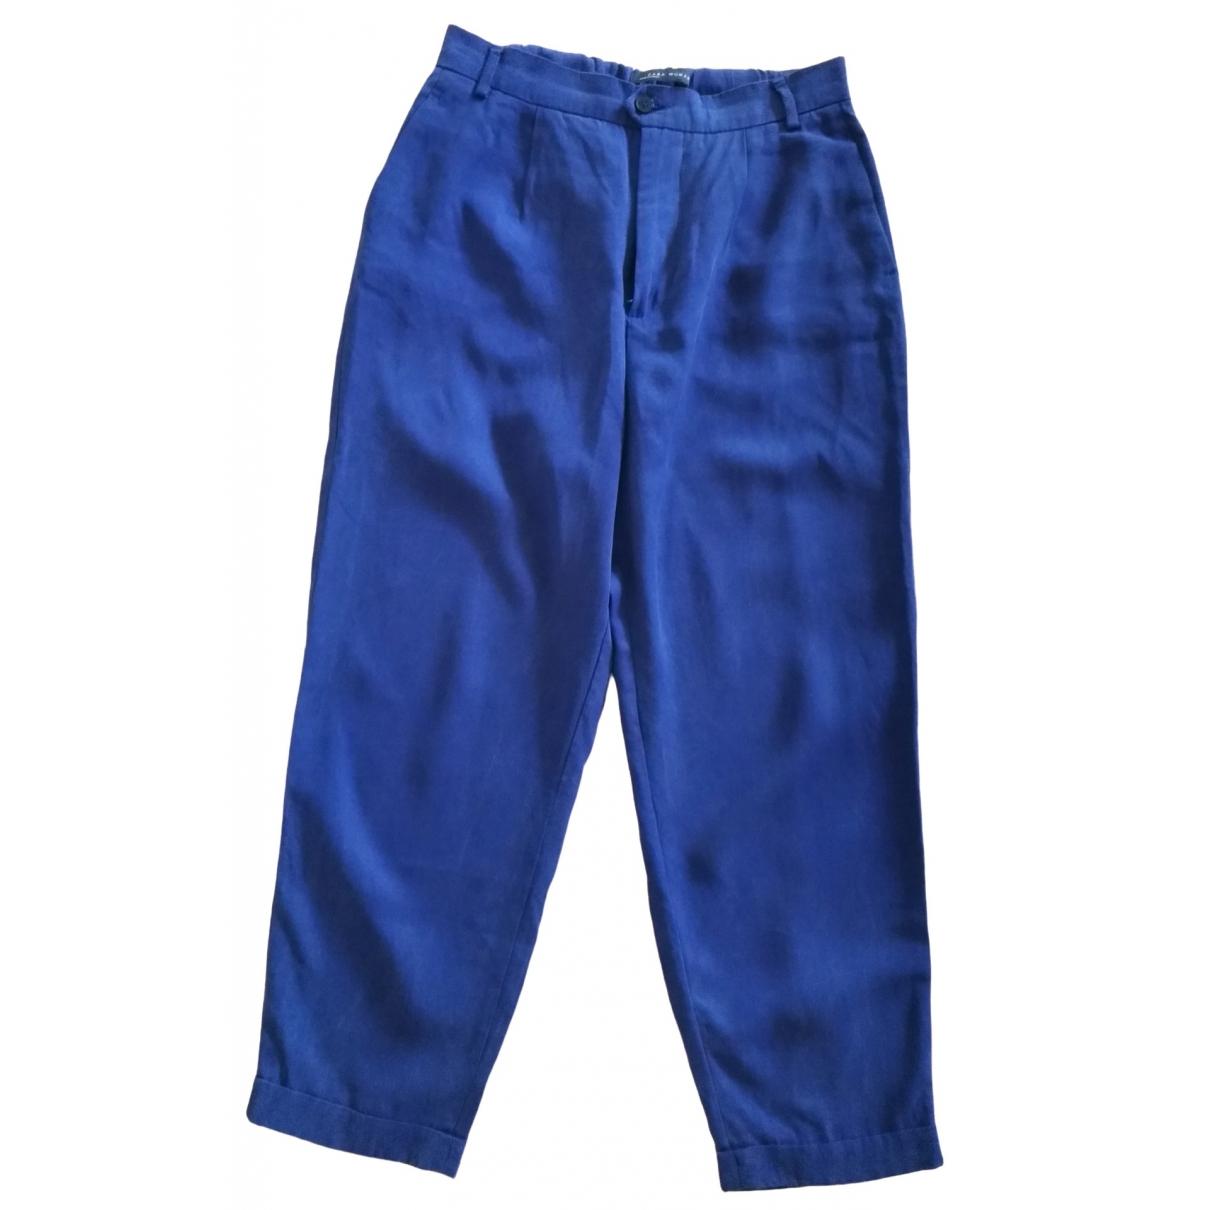 Zara \N Blue Cotton Trousers for Women S International